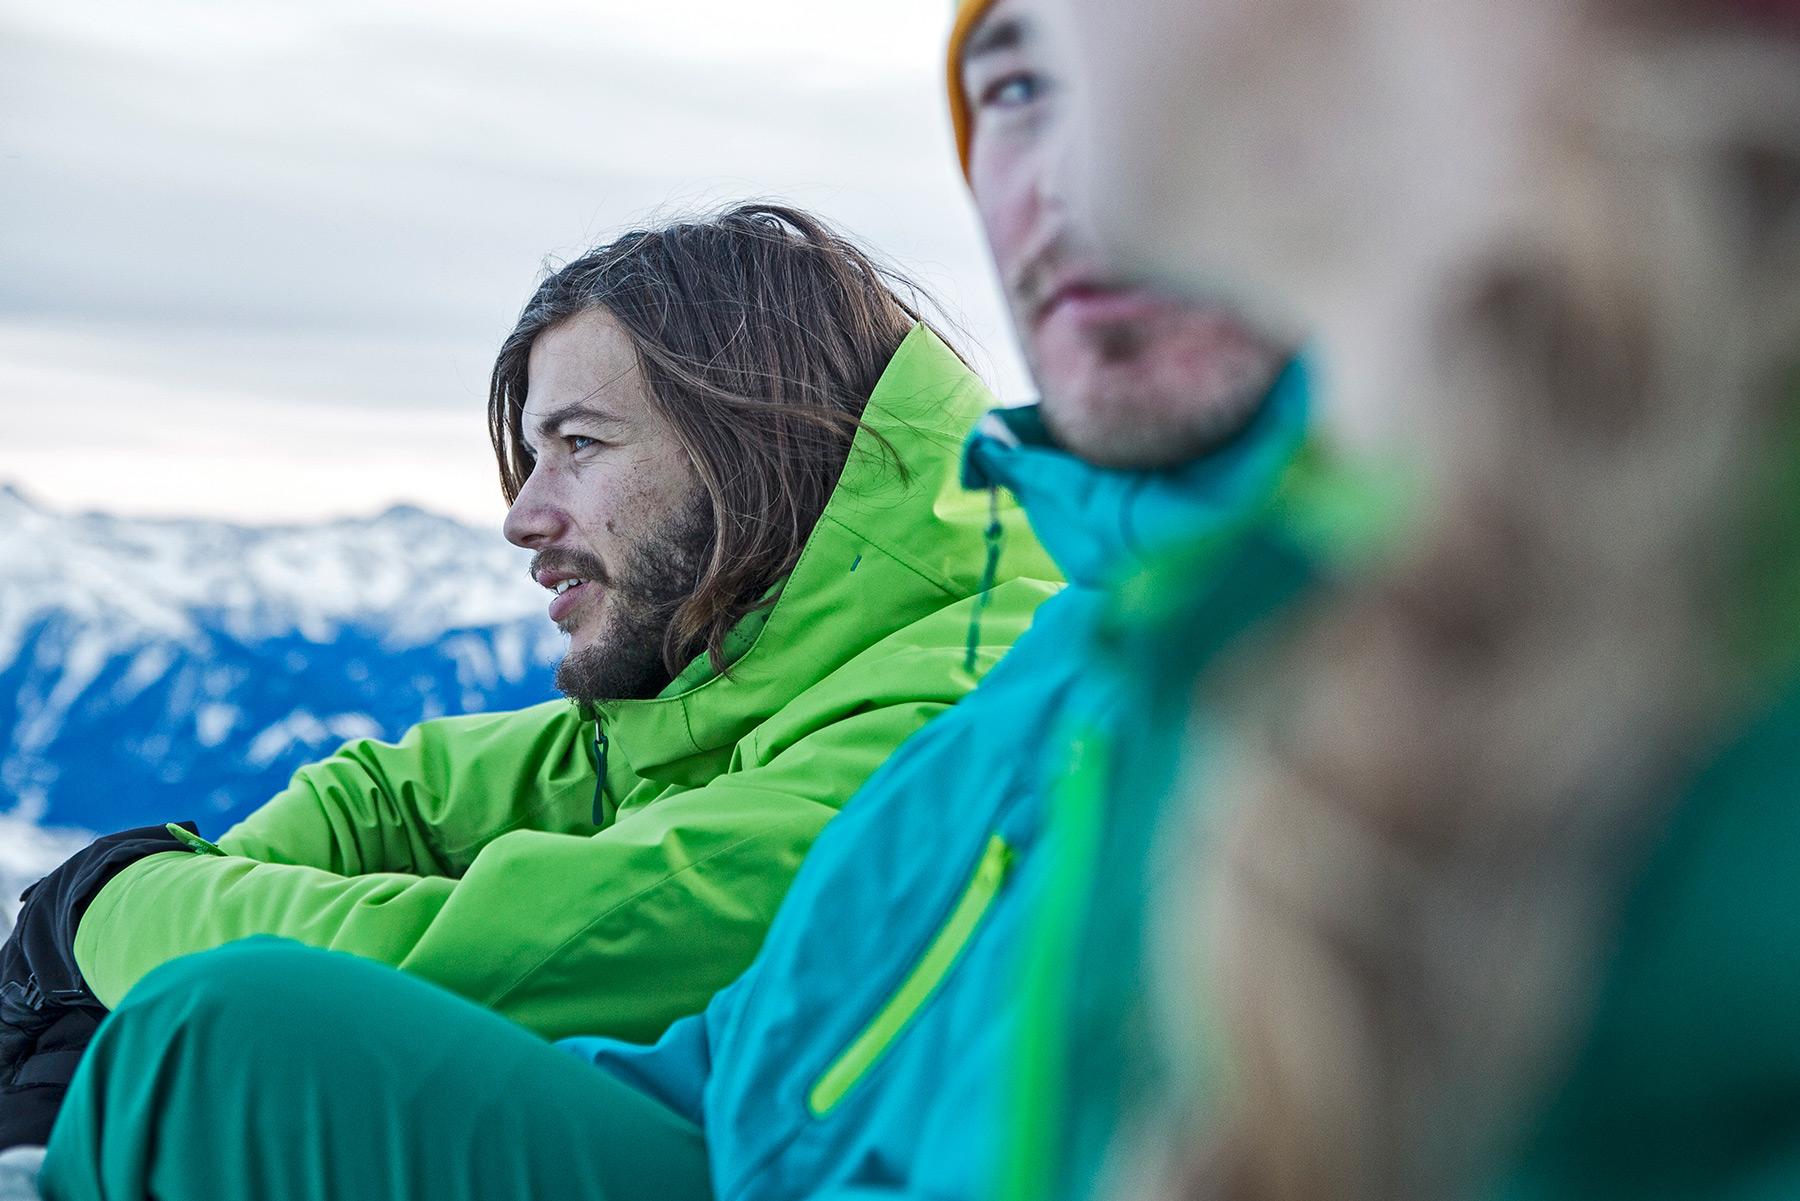 05-Pyua-Dachstein-Ski-Action-Christoph-Gramann